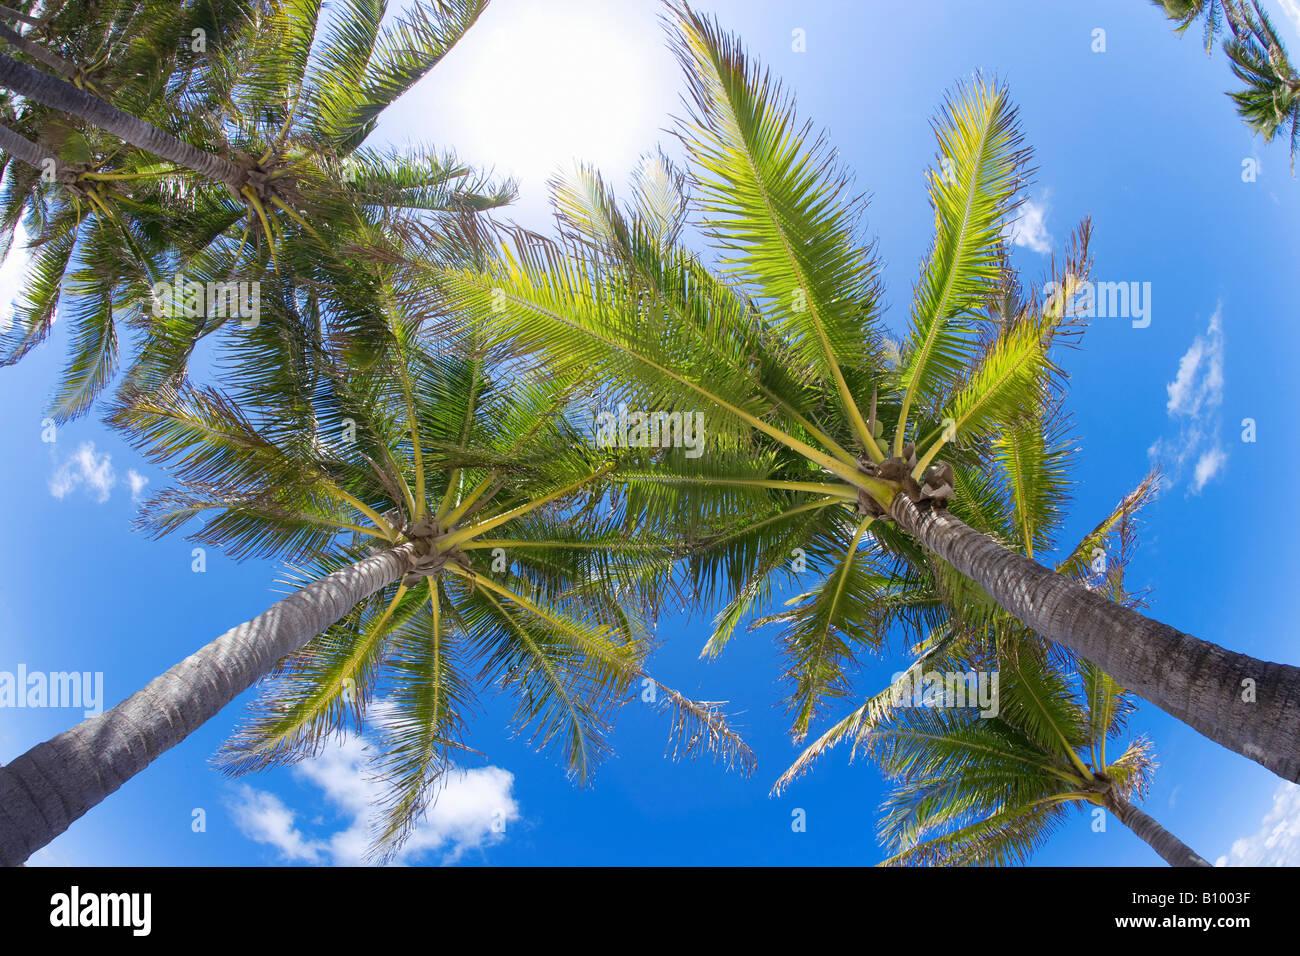 coconut palm trees, upward view in Miami Beach, Florida - Stock Image